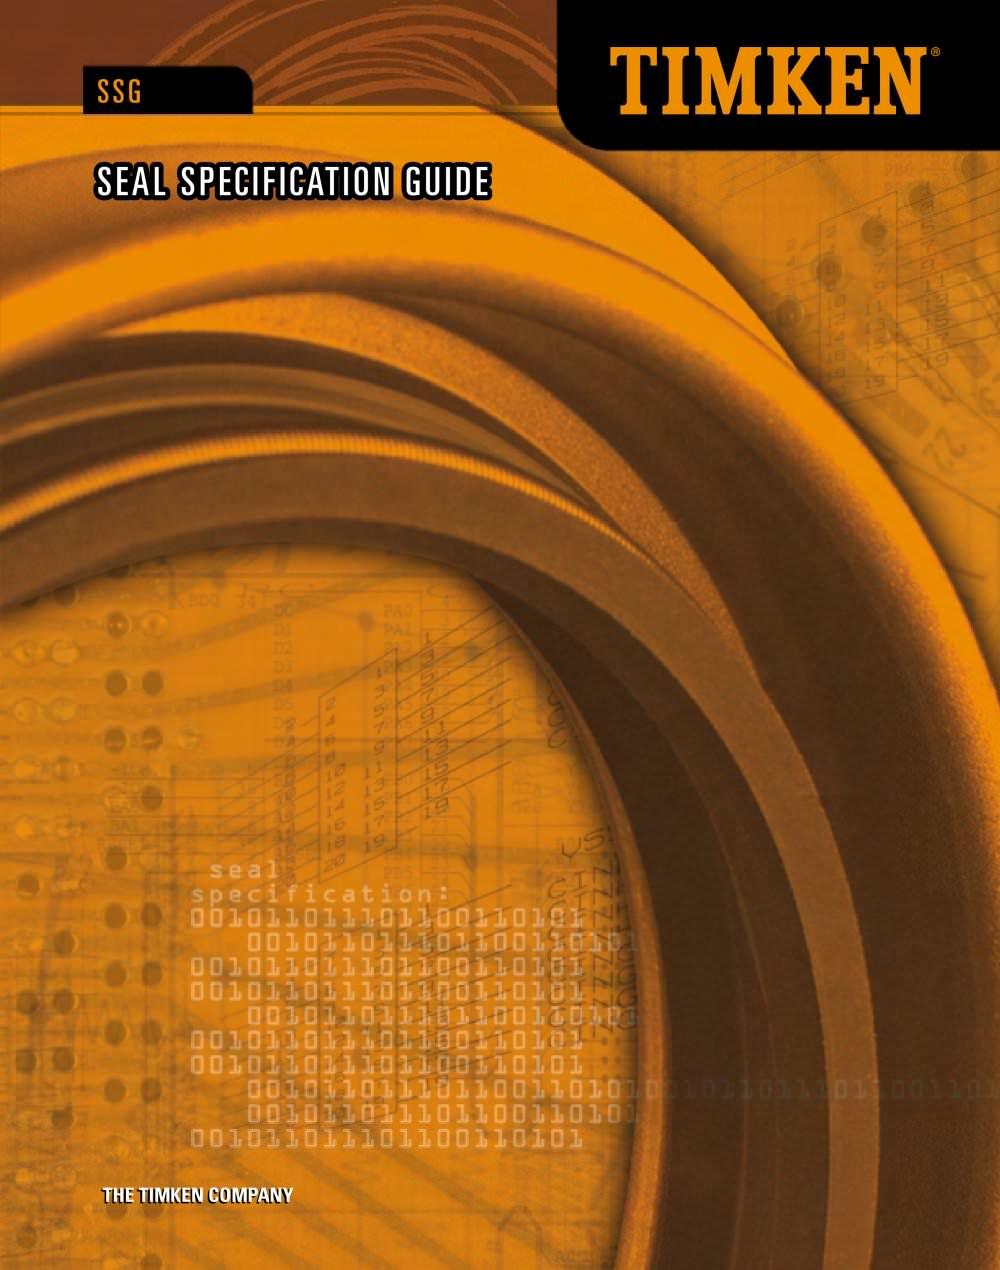 automotive aftermarket seal specification guide timken pdf rh pdf directindustry com Timken Seals Cross Reference Timken Cross Reference